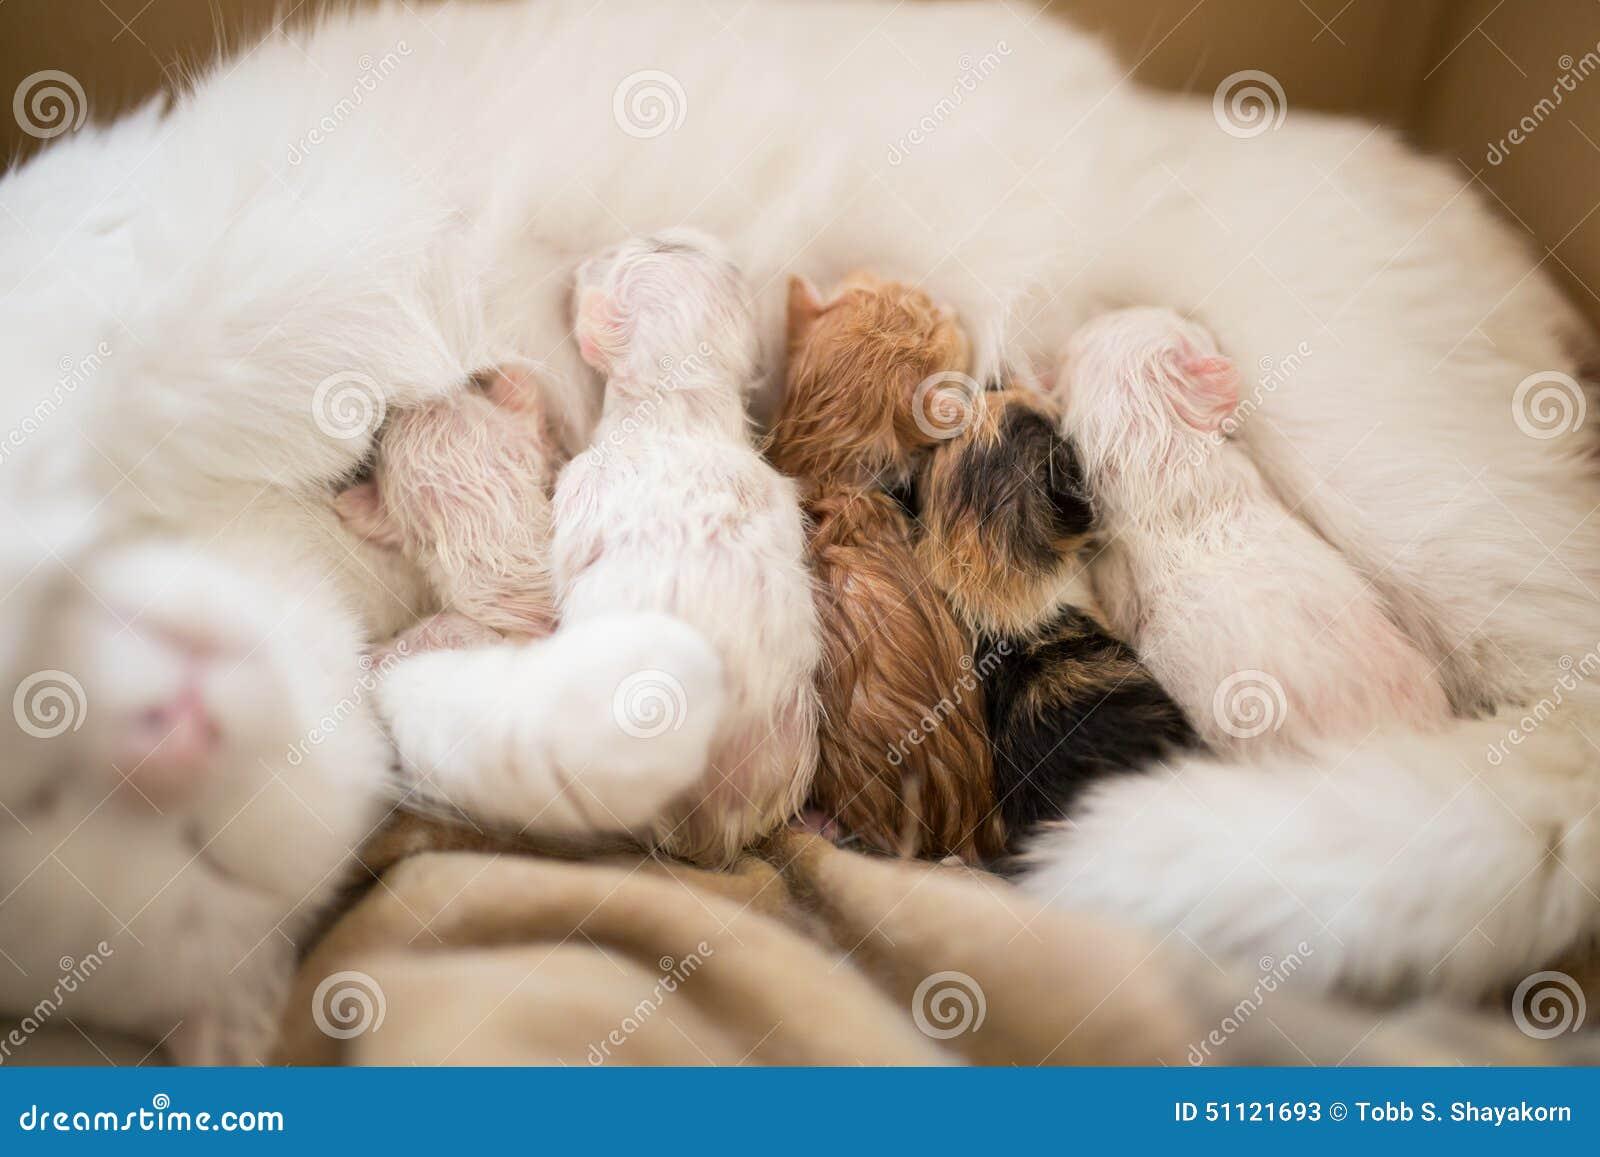 New born cats